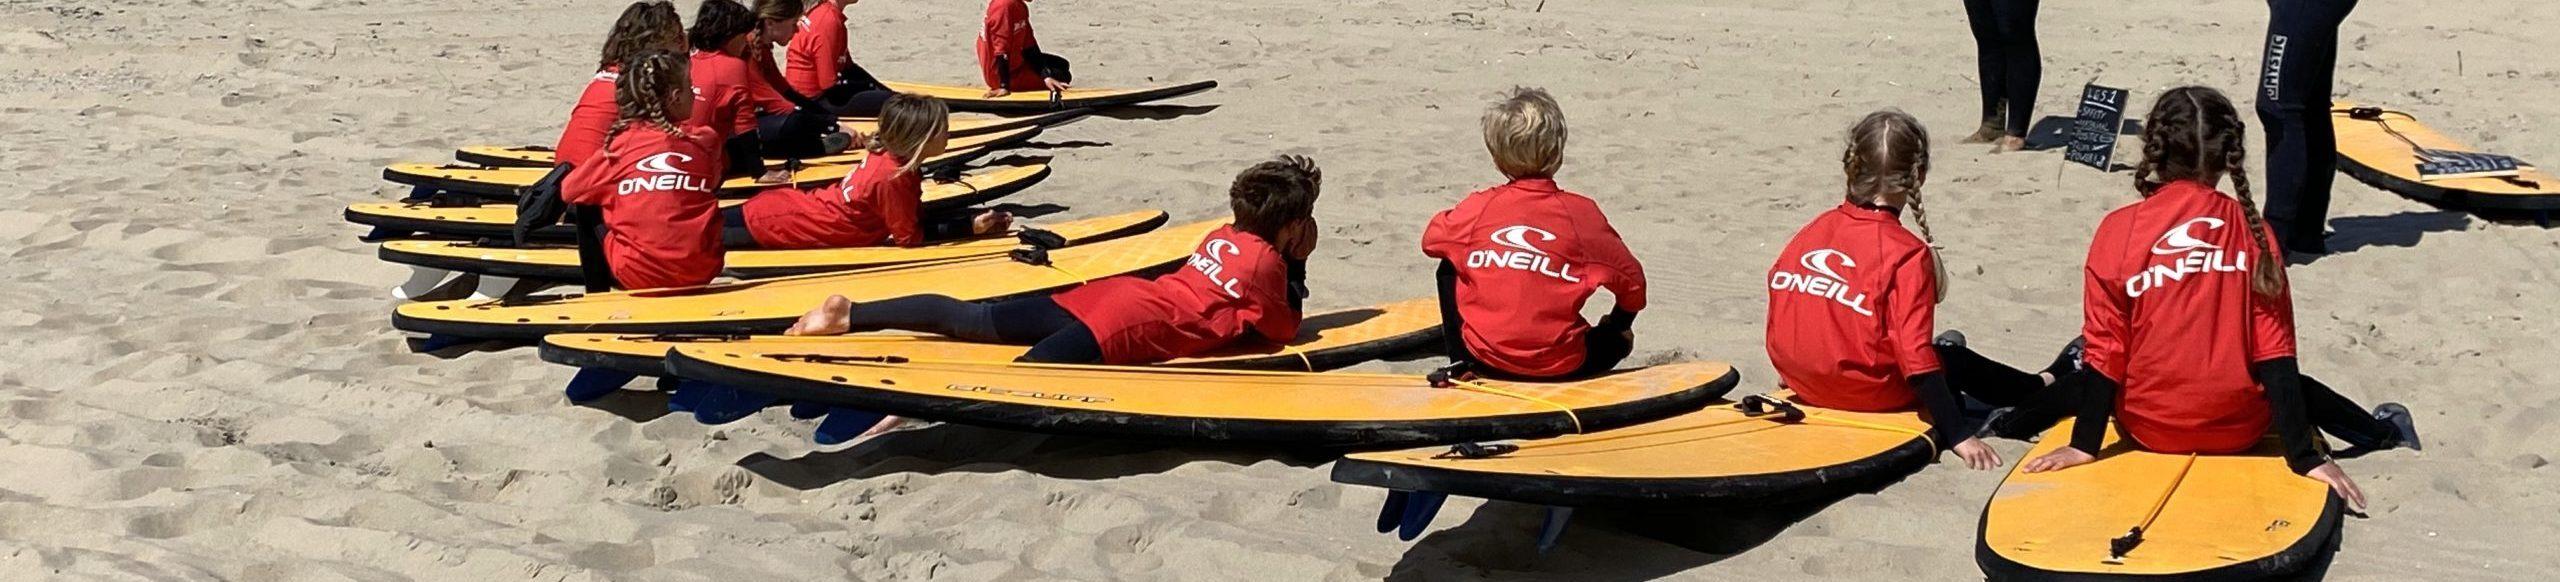 Zomerkamp - Beachcamp Bloemendaal